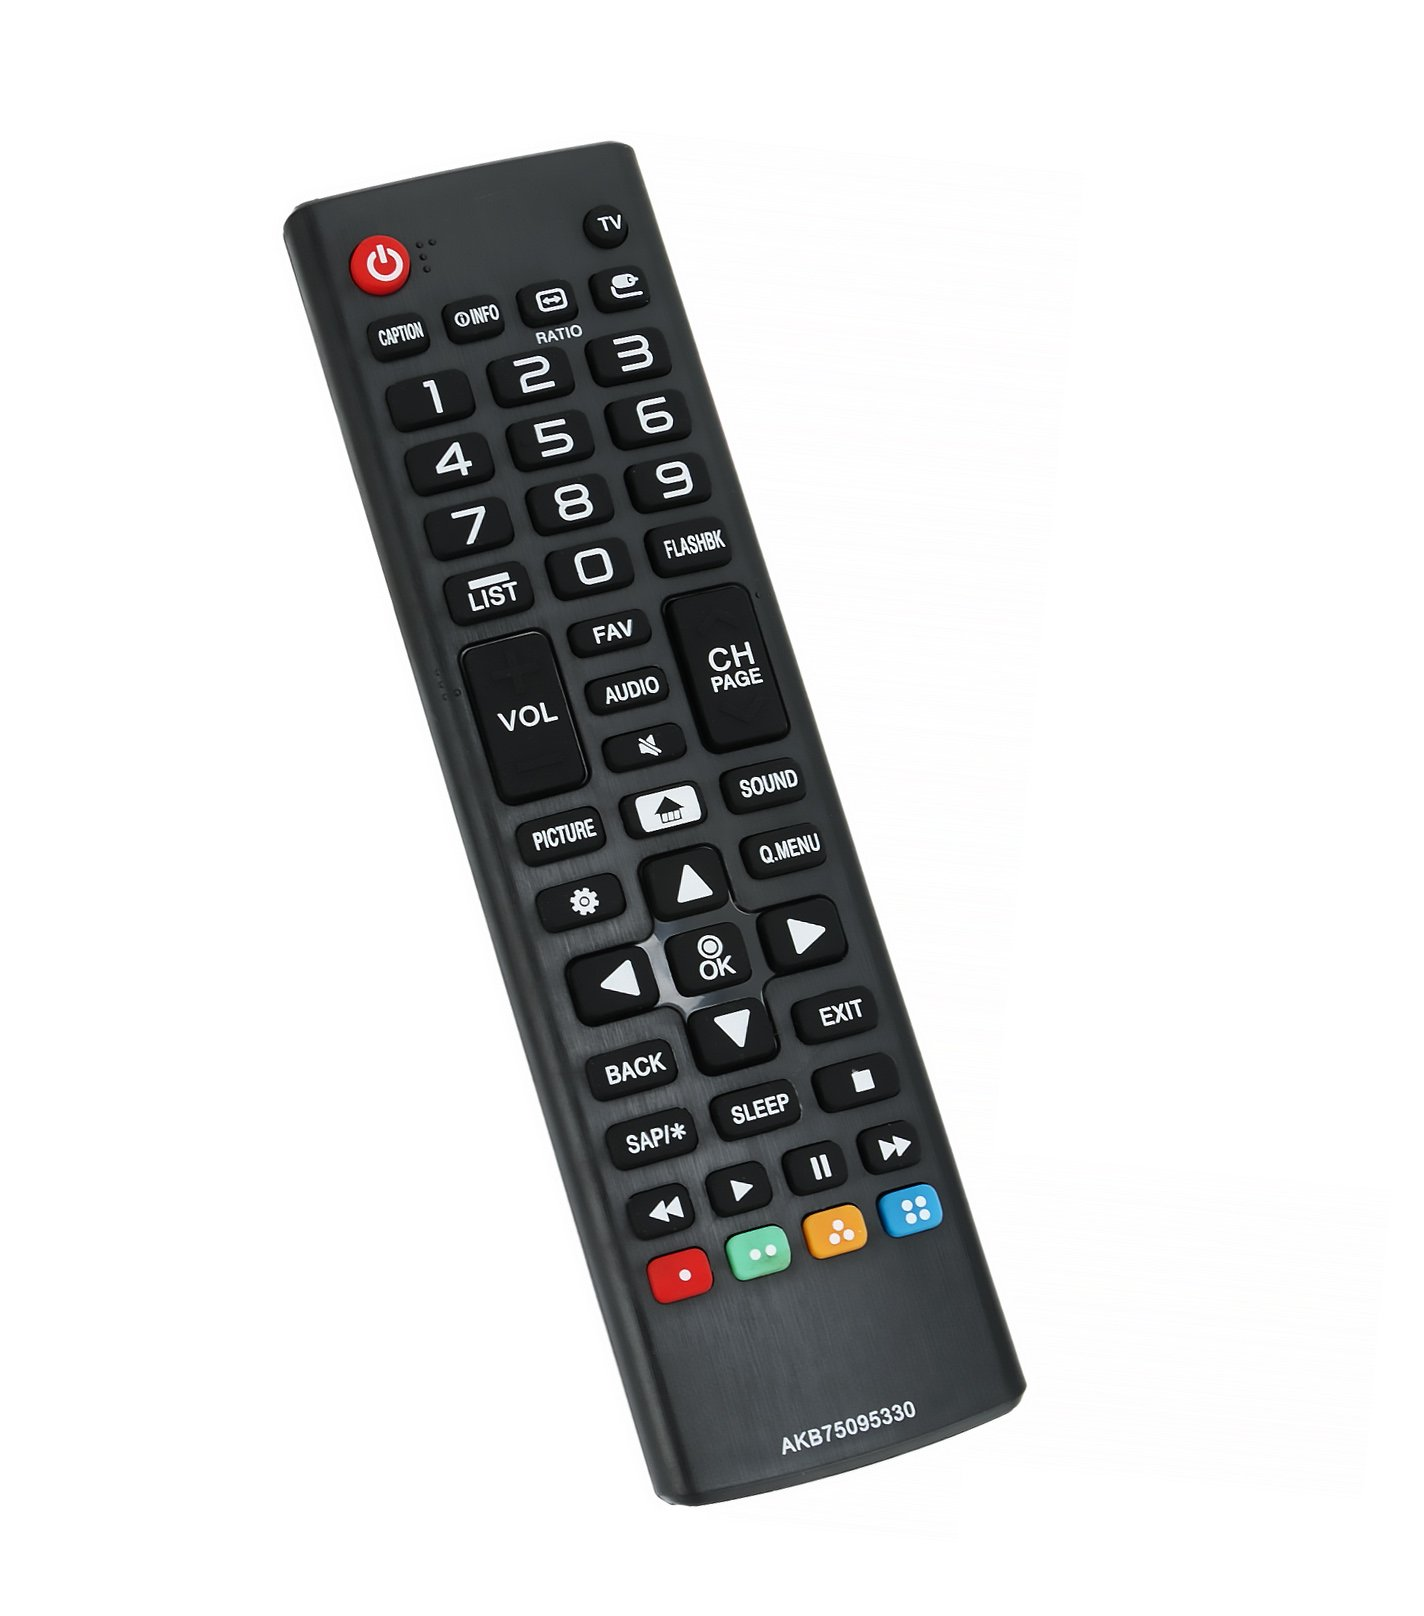 AIDITIYMI New Replace Remote Control AKB75095330 fit for LG LED LCD TV 24LH4830 43LJ500M 28LJ400B